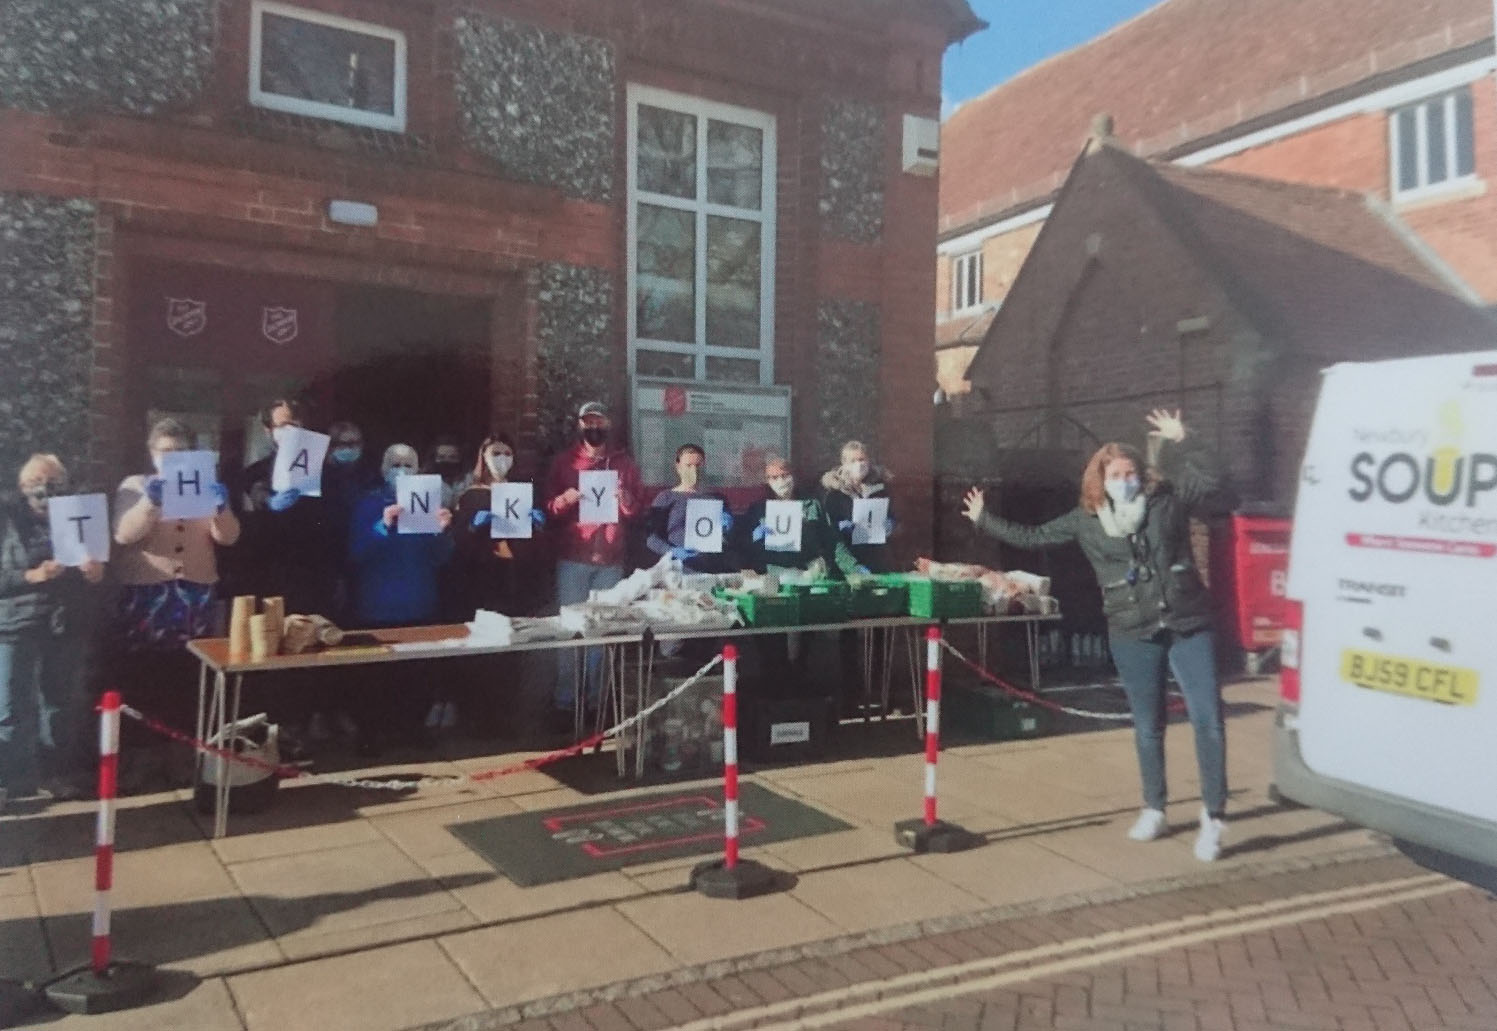 Lifecycle raises £590 for Newbury Soup Kitchen